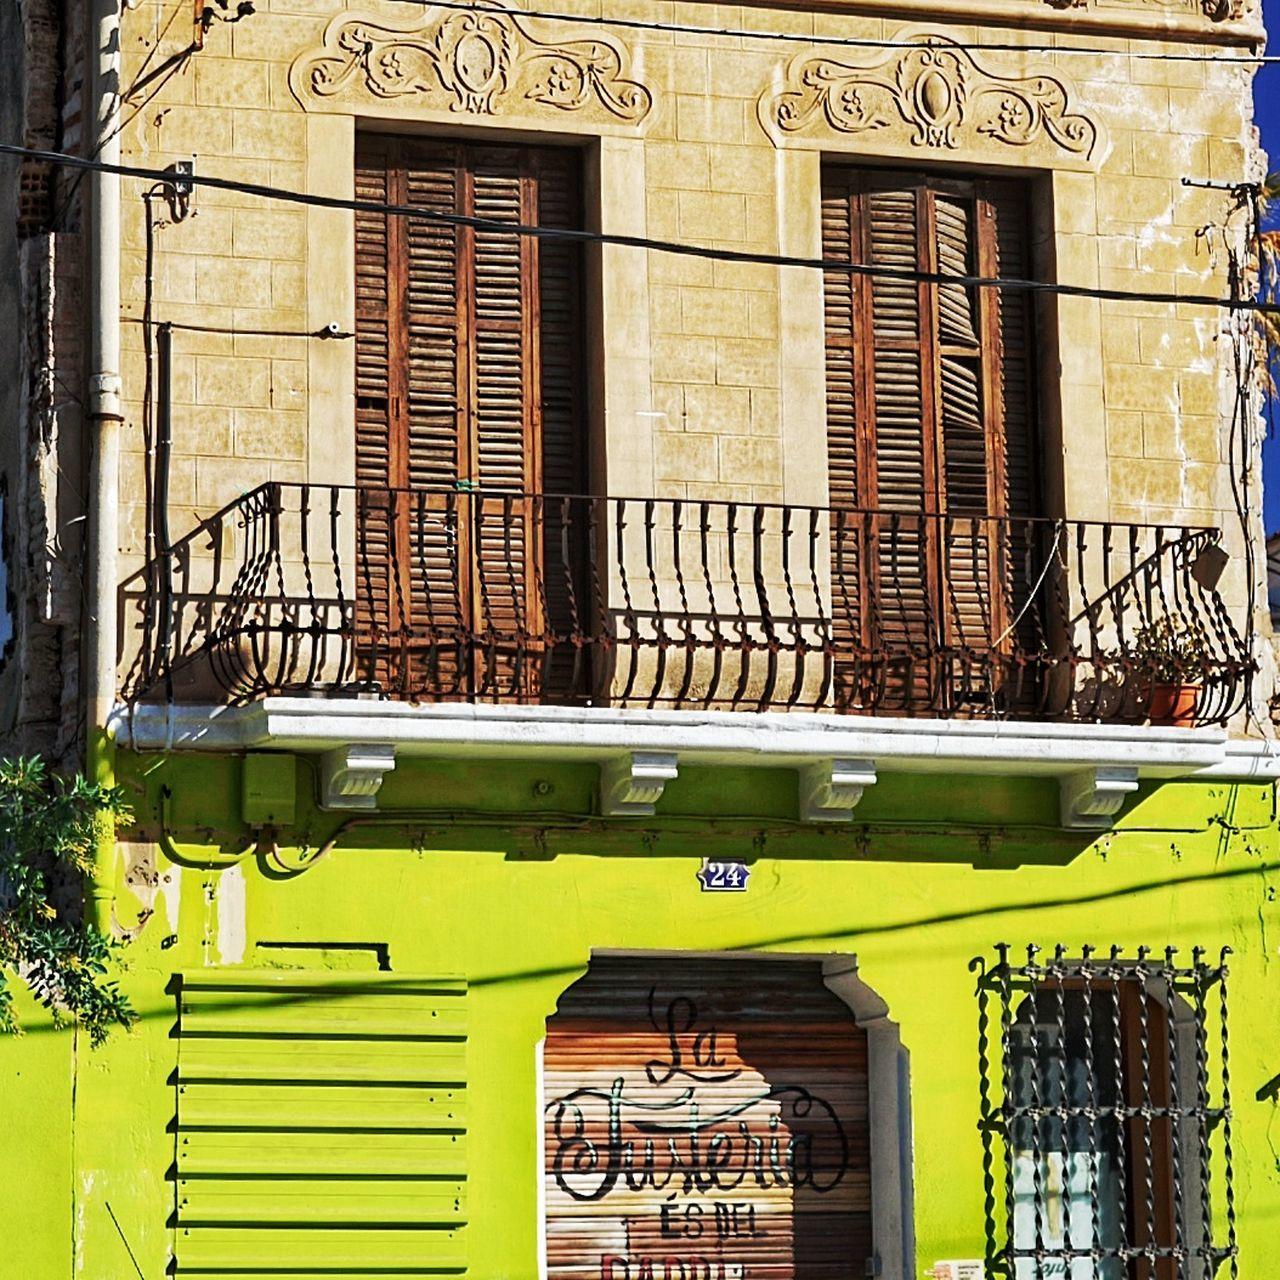 The Changing City Taking Photos Streetphotography Sonya6000 Spainish Building Oldbuilding Shutters The Week Of Eyeem This Week On Eye Em